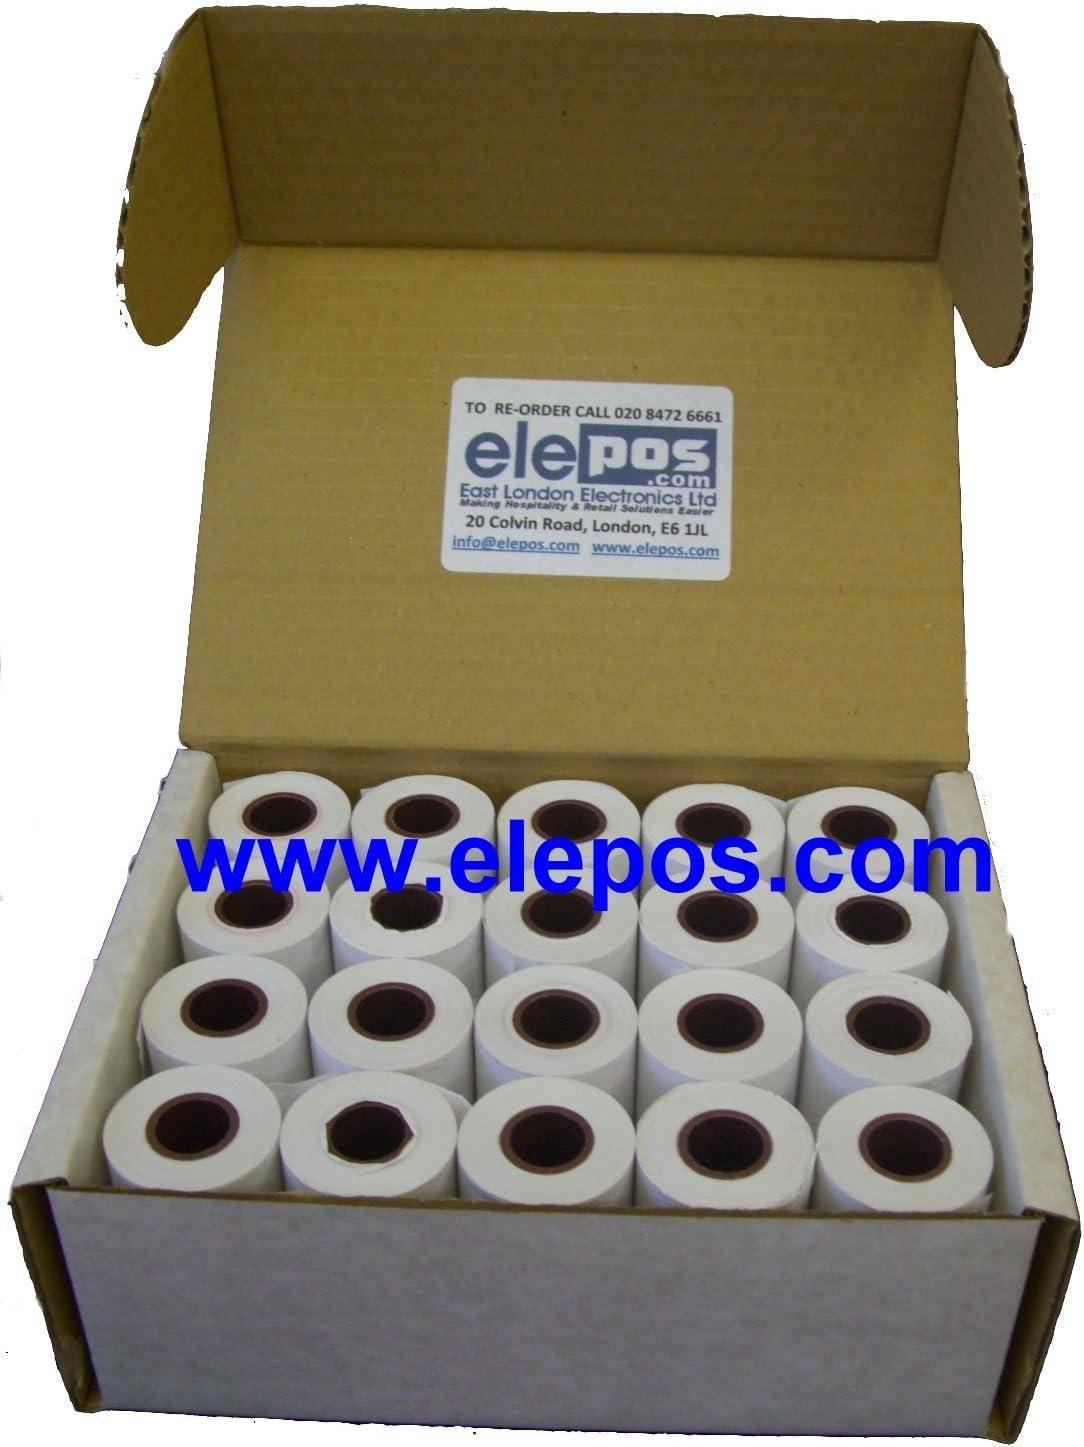 20 Rolls elePOS/® 57x30 Thermal Rolls to fit Able AP1300-BT AP-1300BT AP1300BT